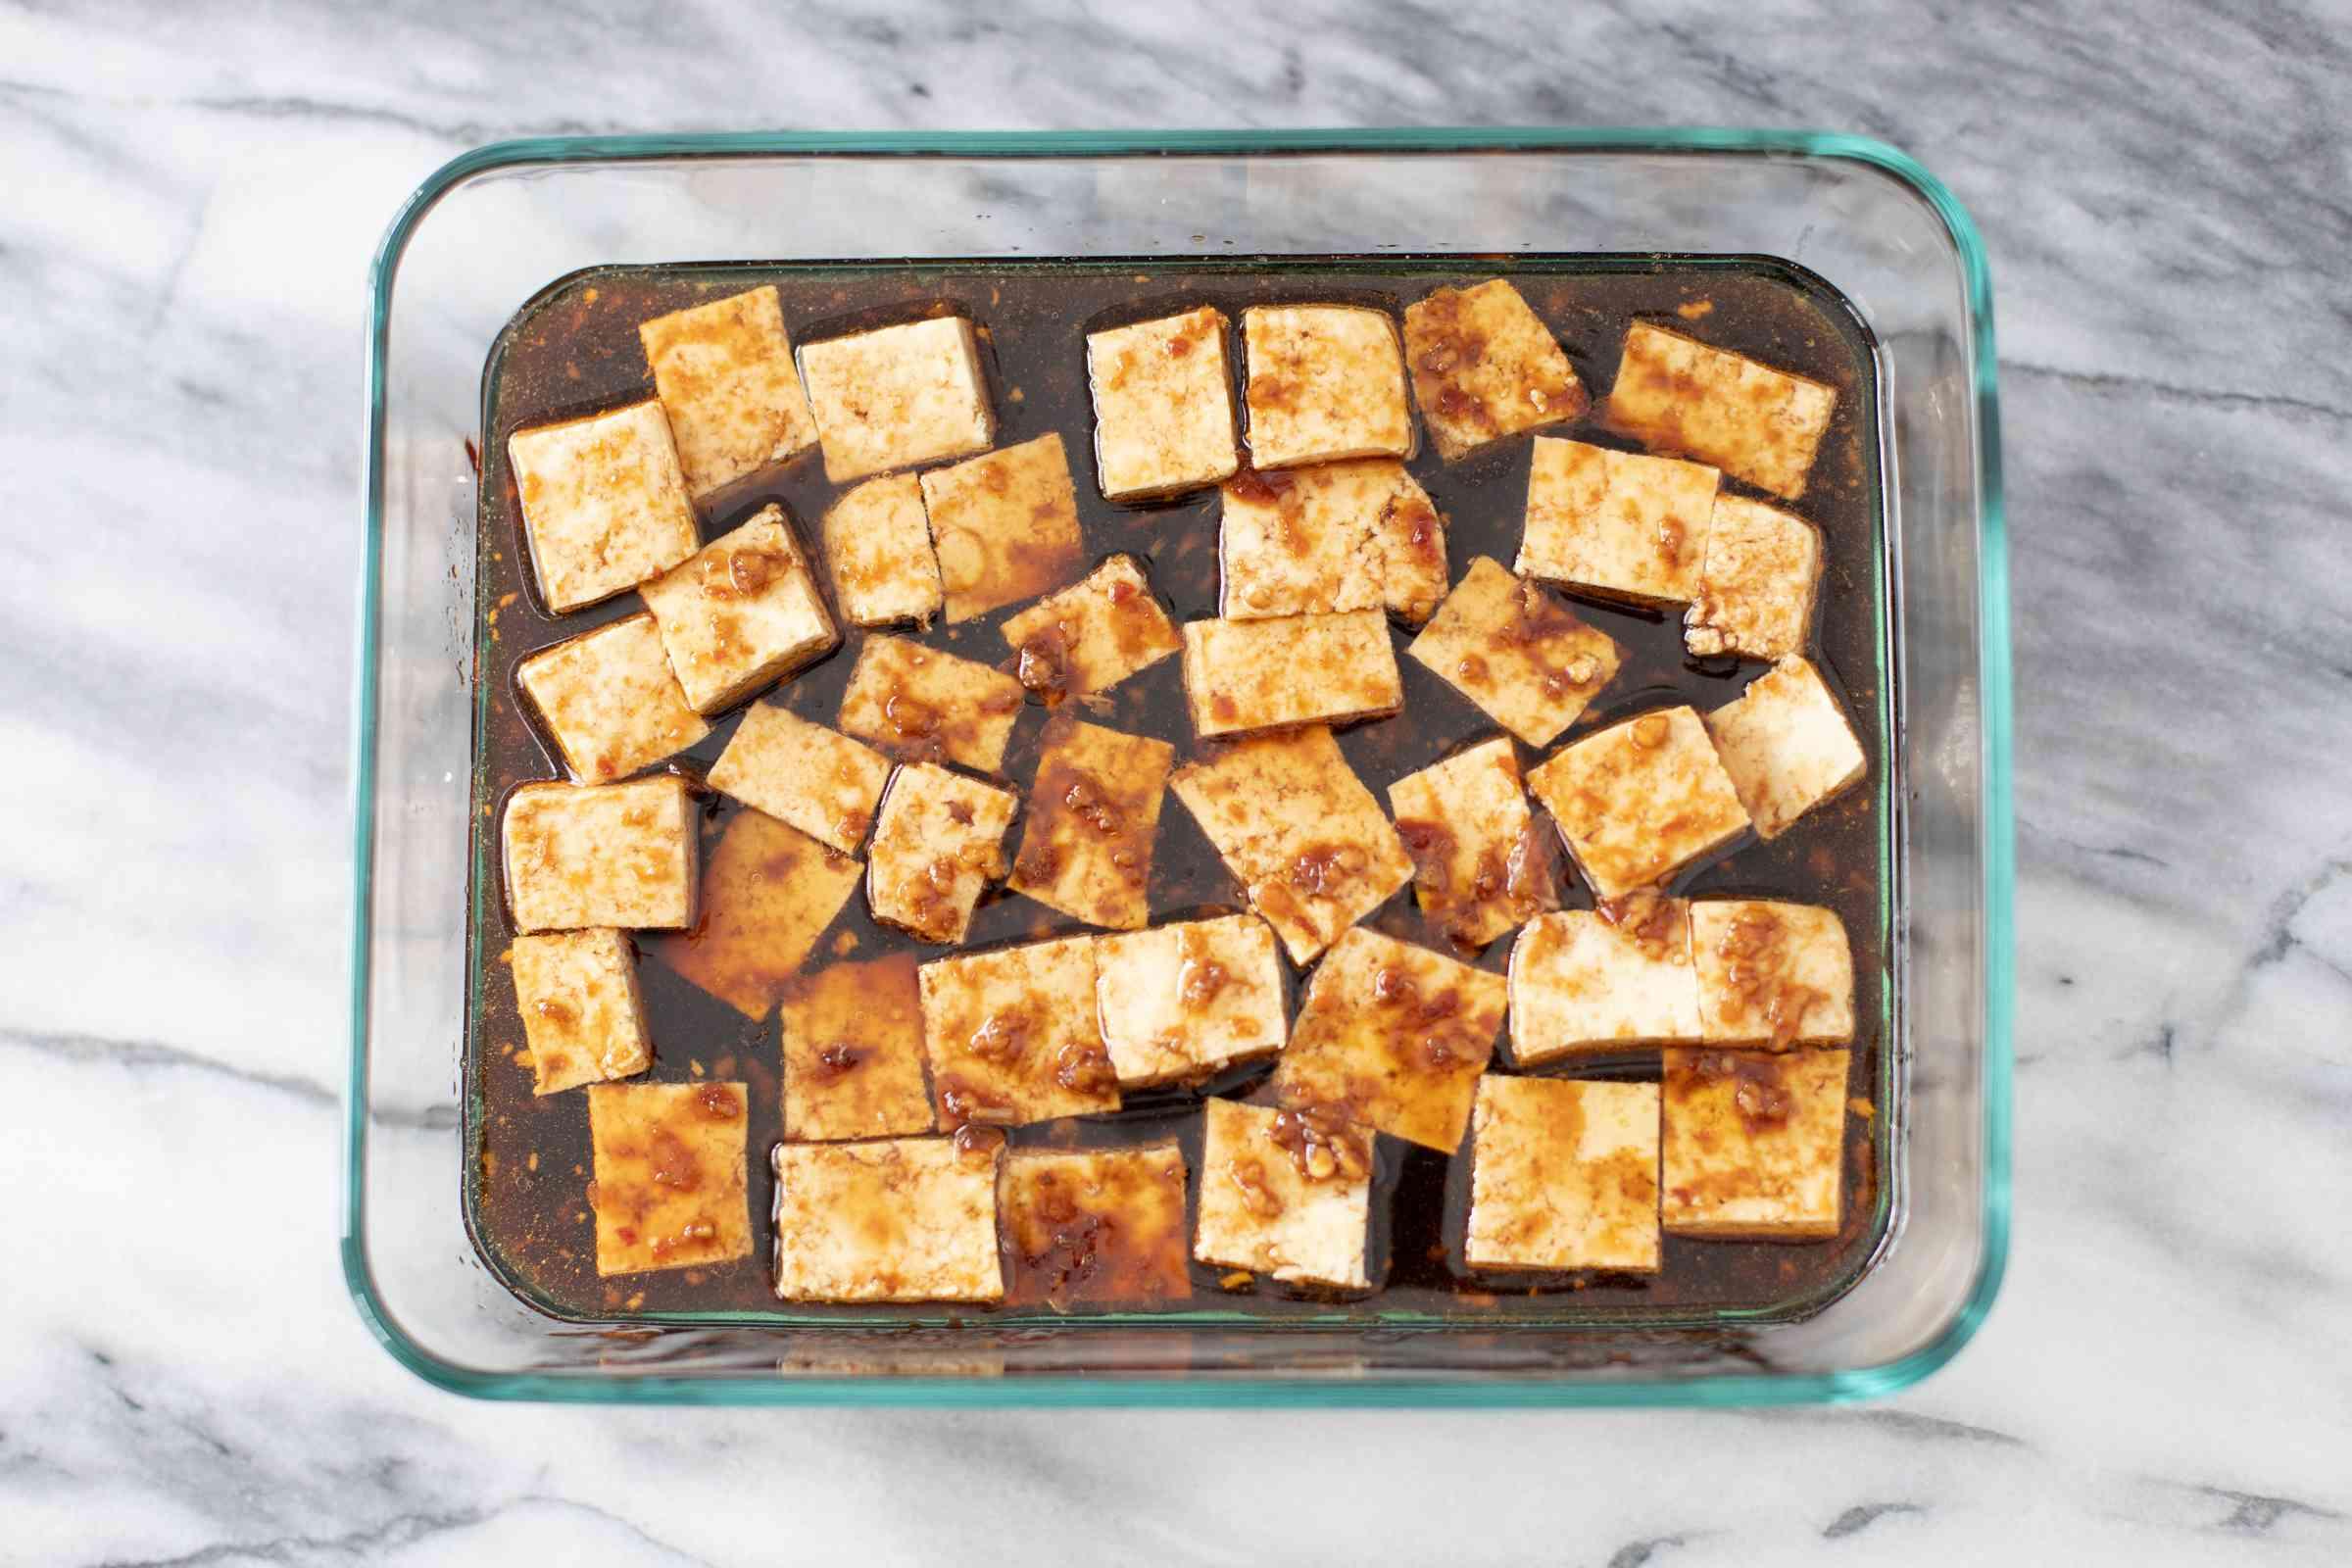 tofu cubes marinating in dish